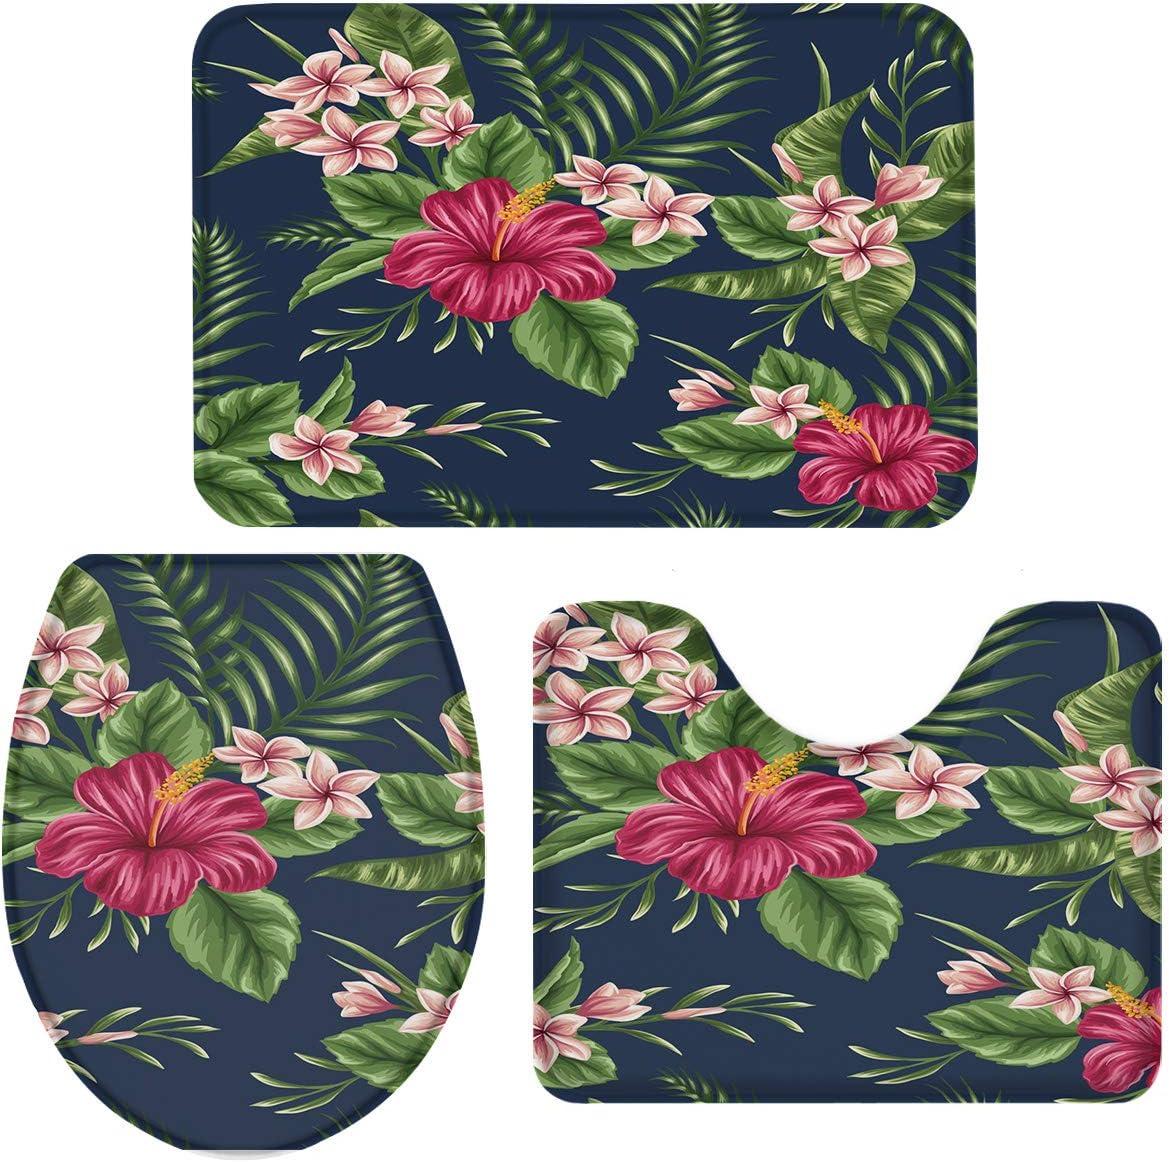 Tropical Hibiscus Flower Plant 3 Piece Plush Bathroom Rugs Set Non Slip Water Absorbent Tub Shower Mats Bath Rug U Shape Contoured Toilet Mat Lid Cover 18 X30 14 X18 15 X18 Vintage Home Kitchen